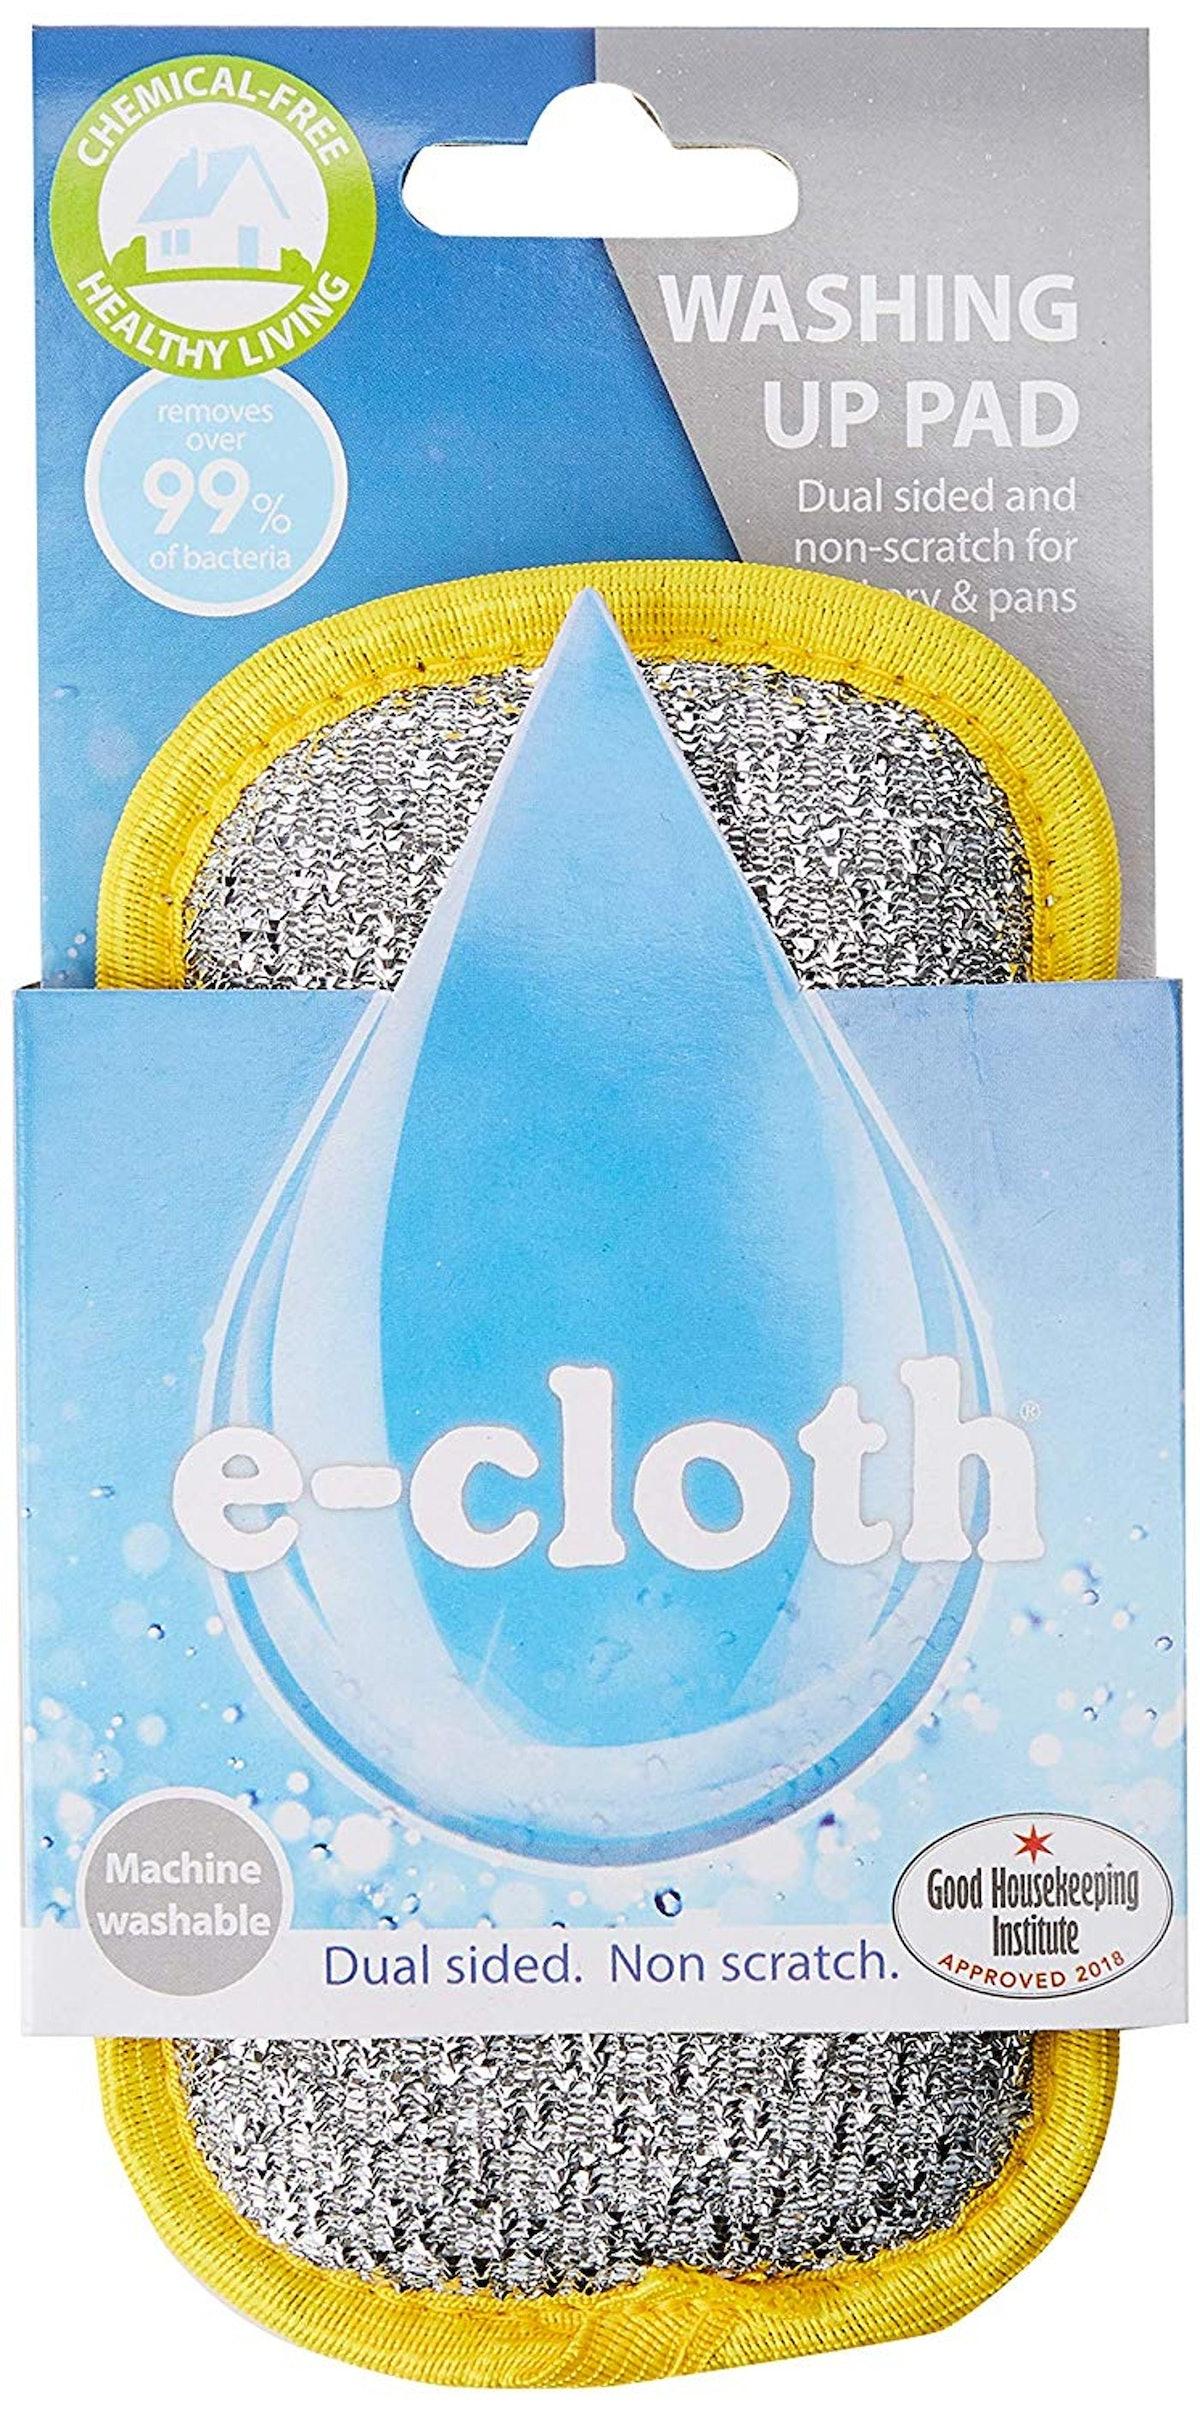 E-Cloth Washing Up Pad